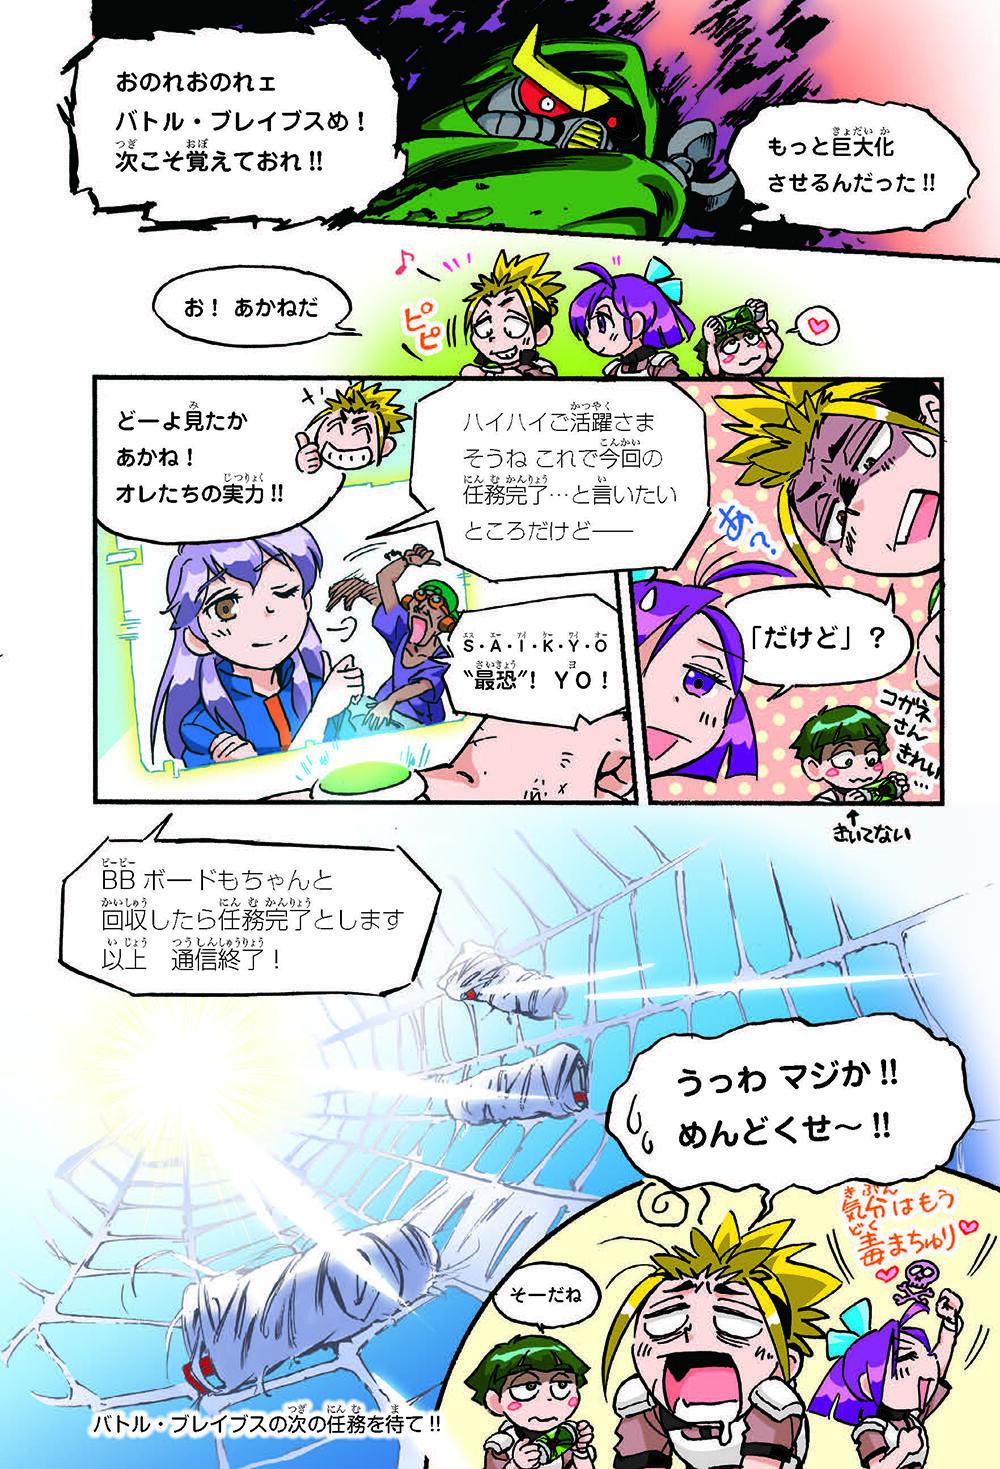 BB_蜊ア髯コ逕溽黄_繝倥z繝シ繧キ繧兩149.jpg